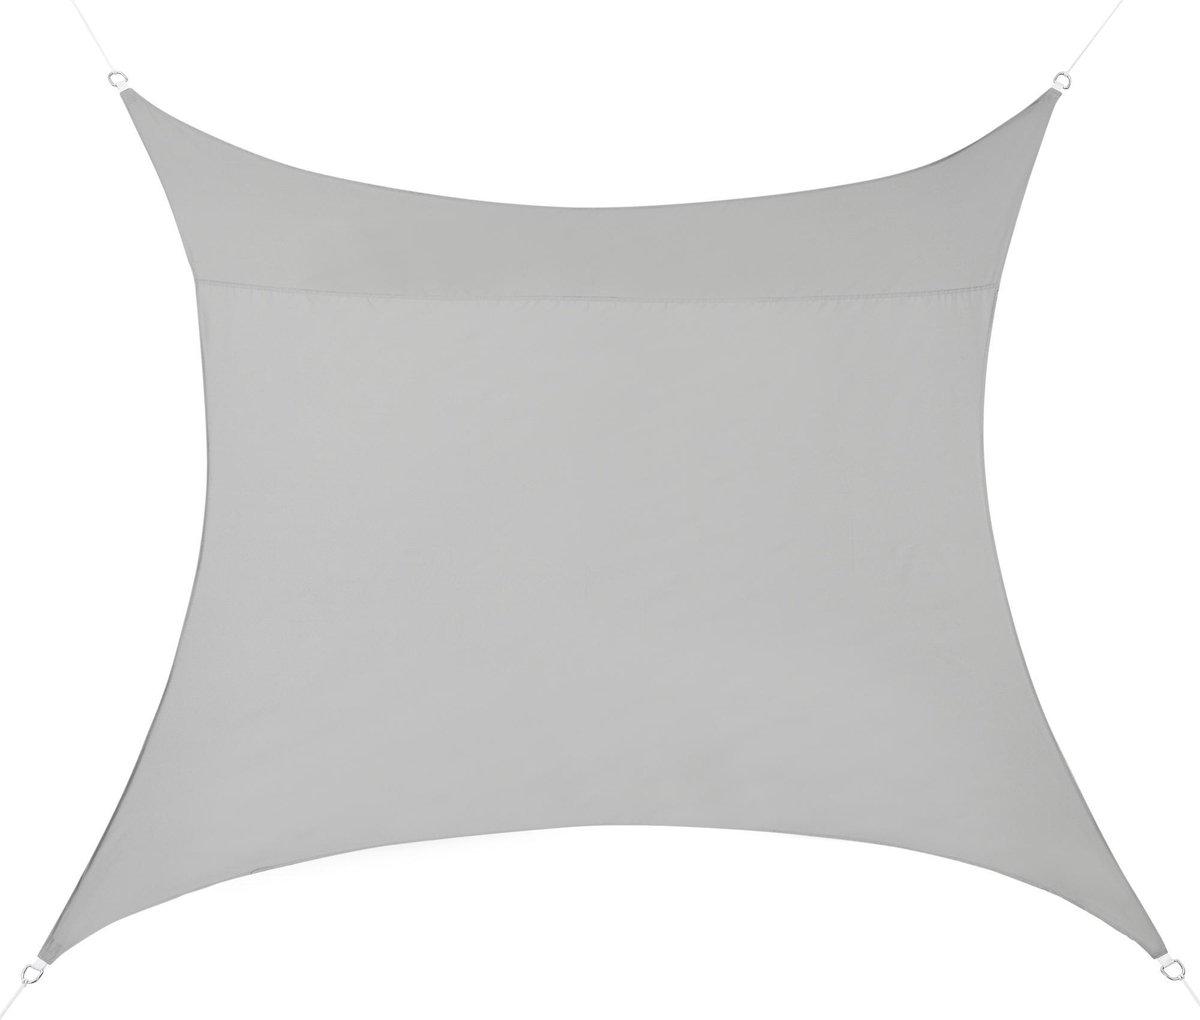 Schaduwdoek - waterafstotend vierkant 3x3 m lichtgrijs